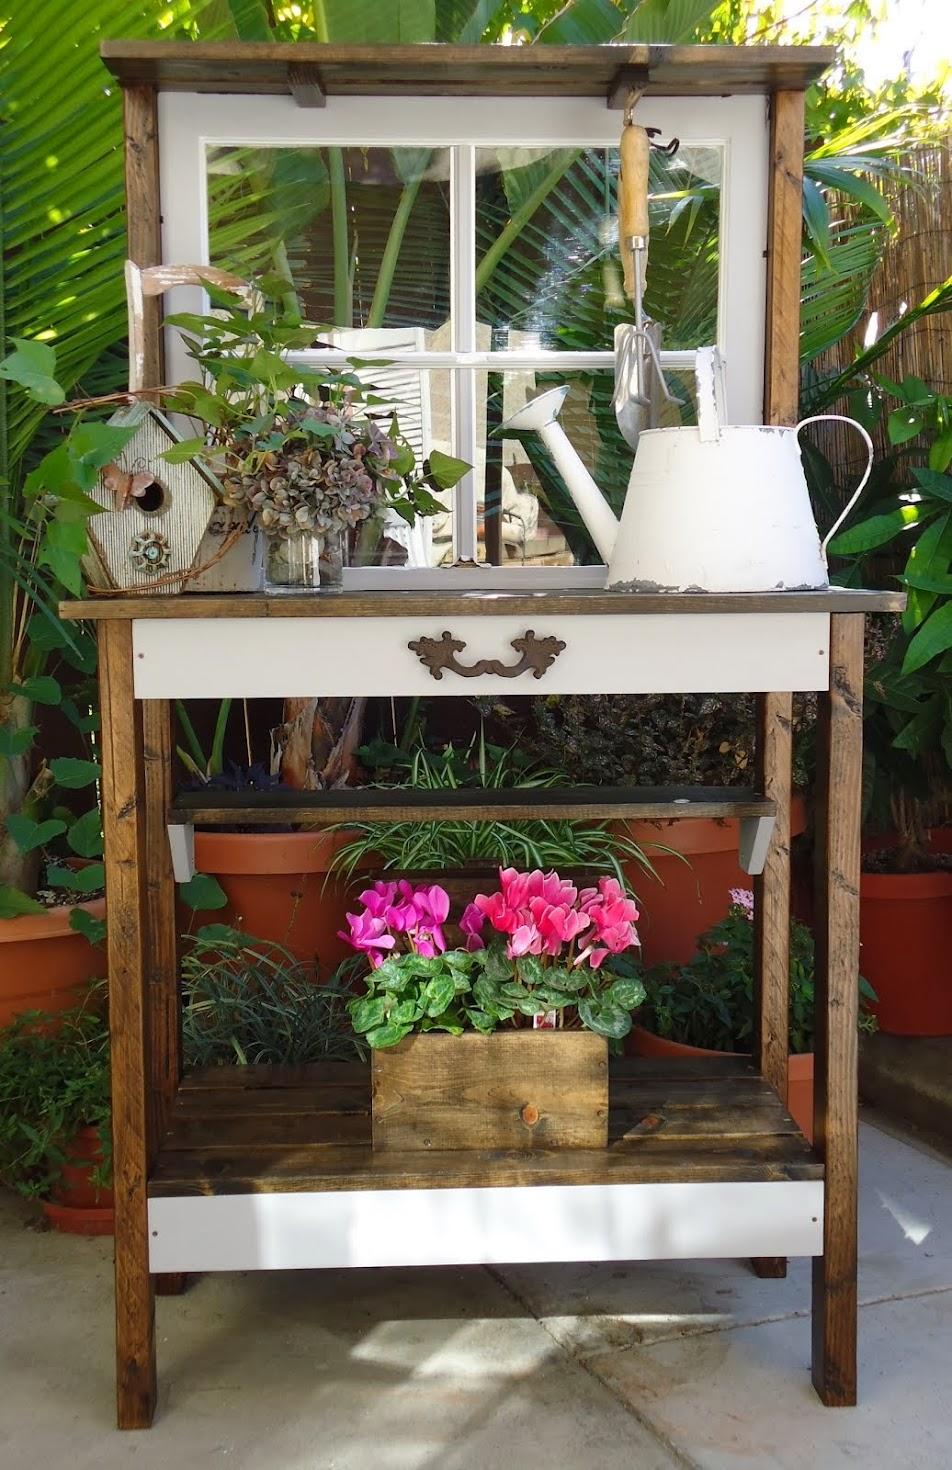 Vintage Window Potting Table - SOLD